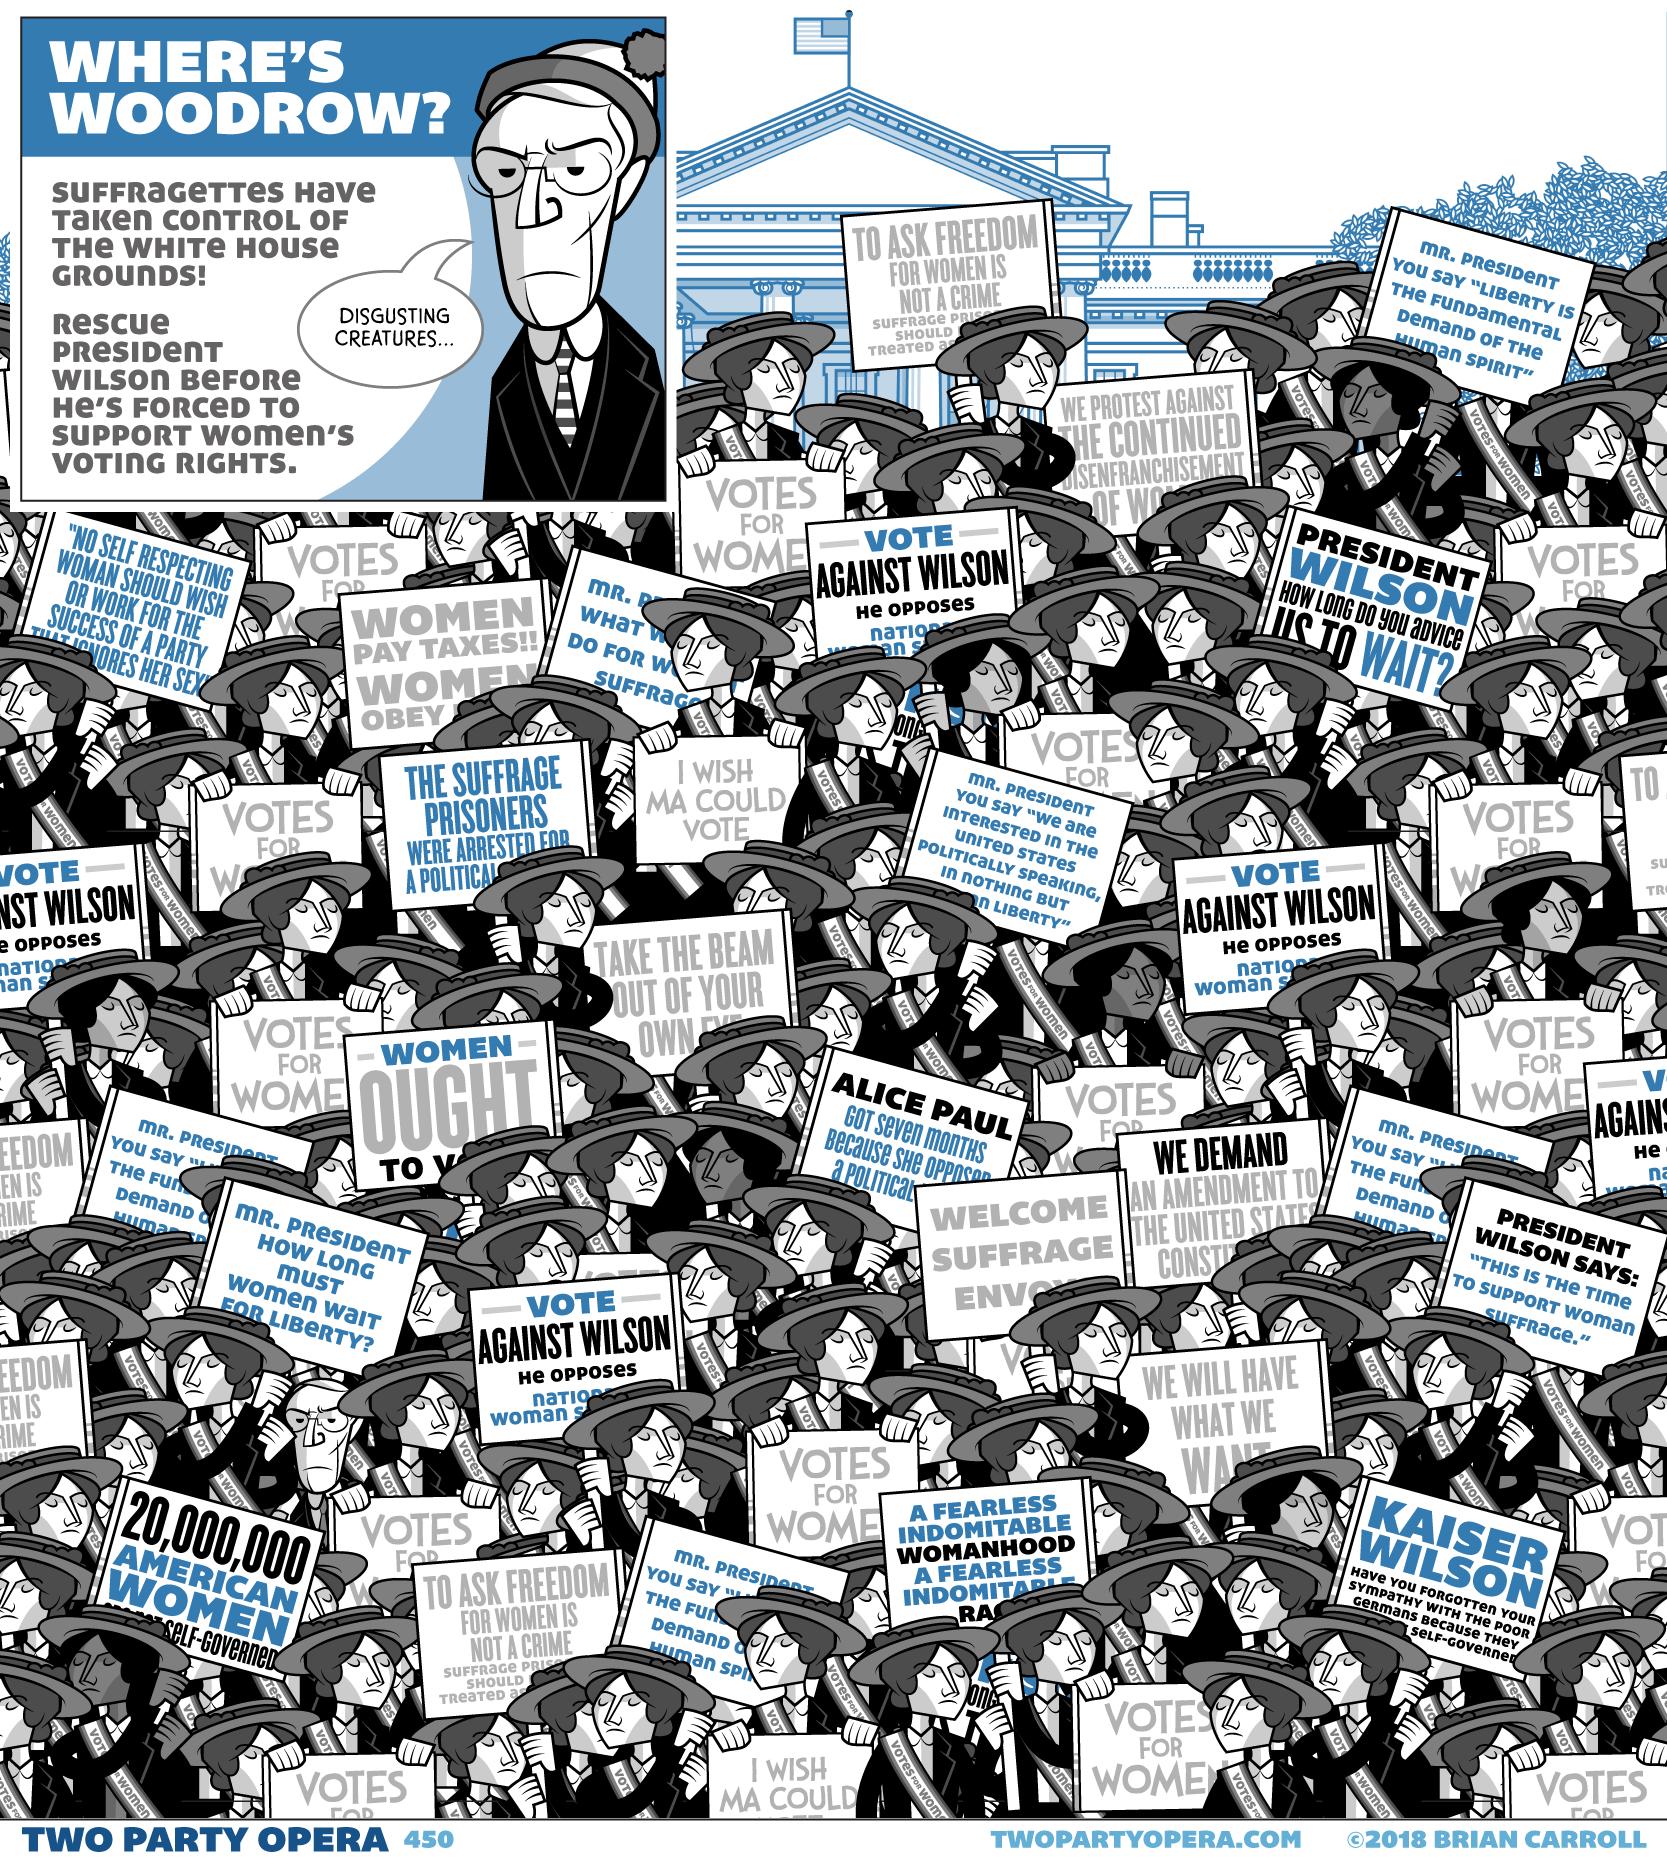 Where's Woodrow?